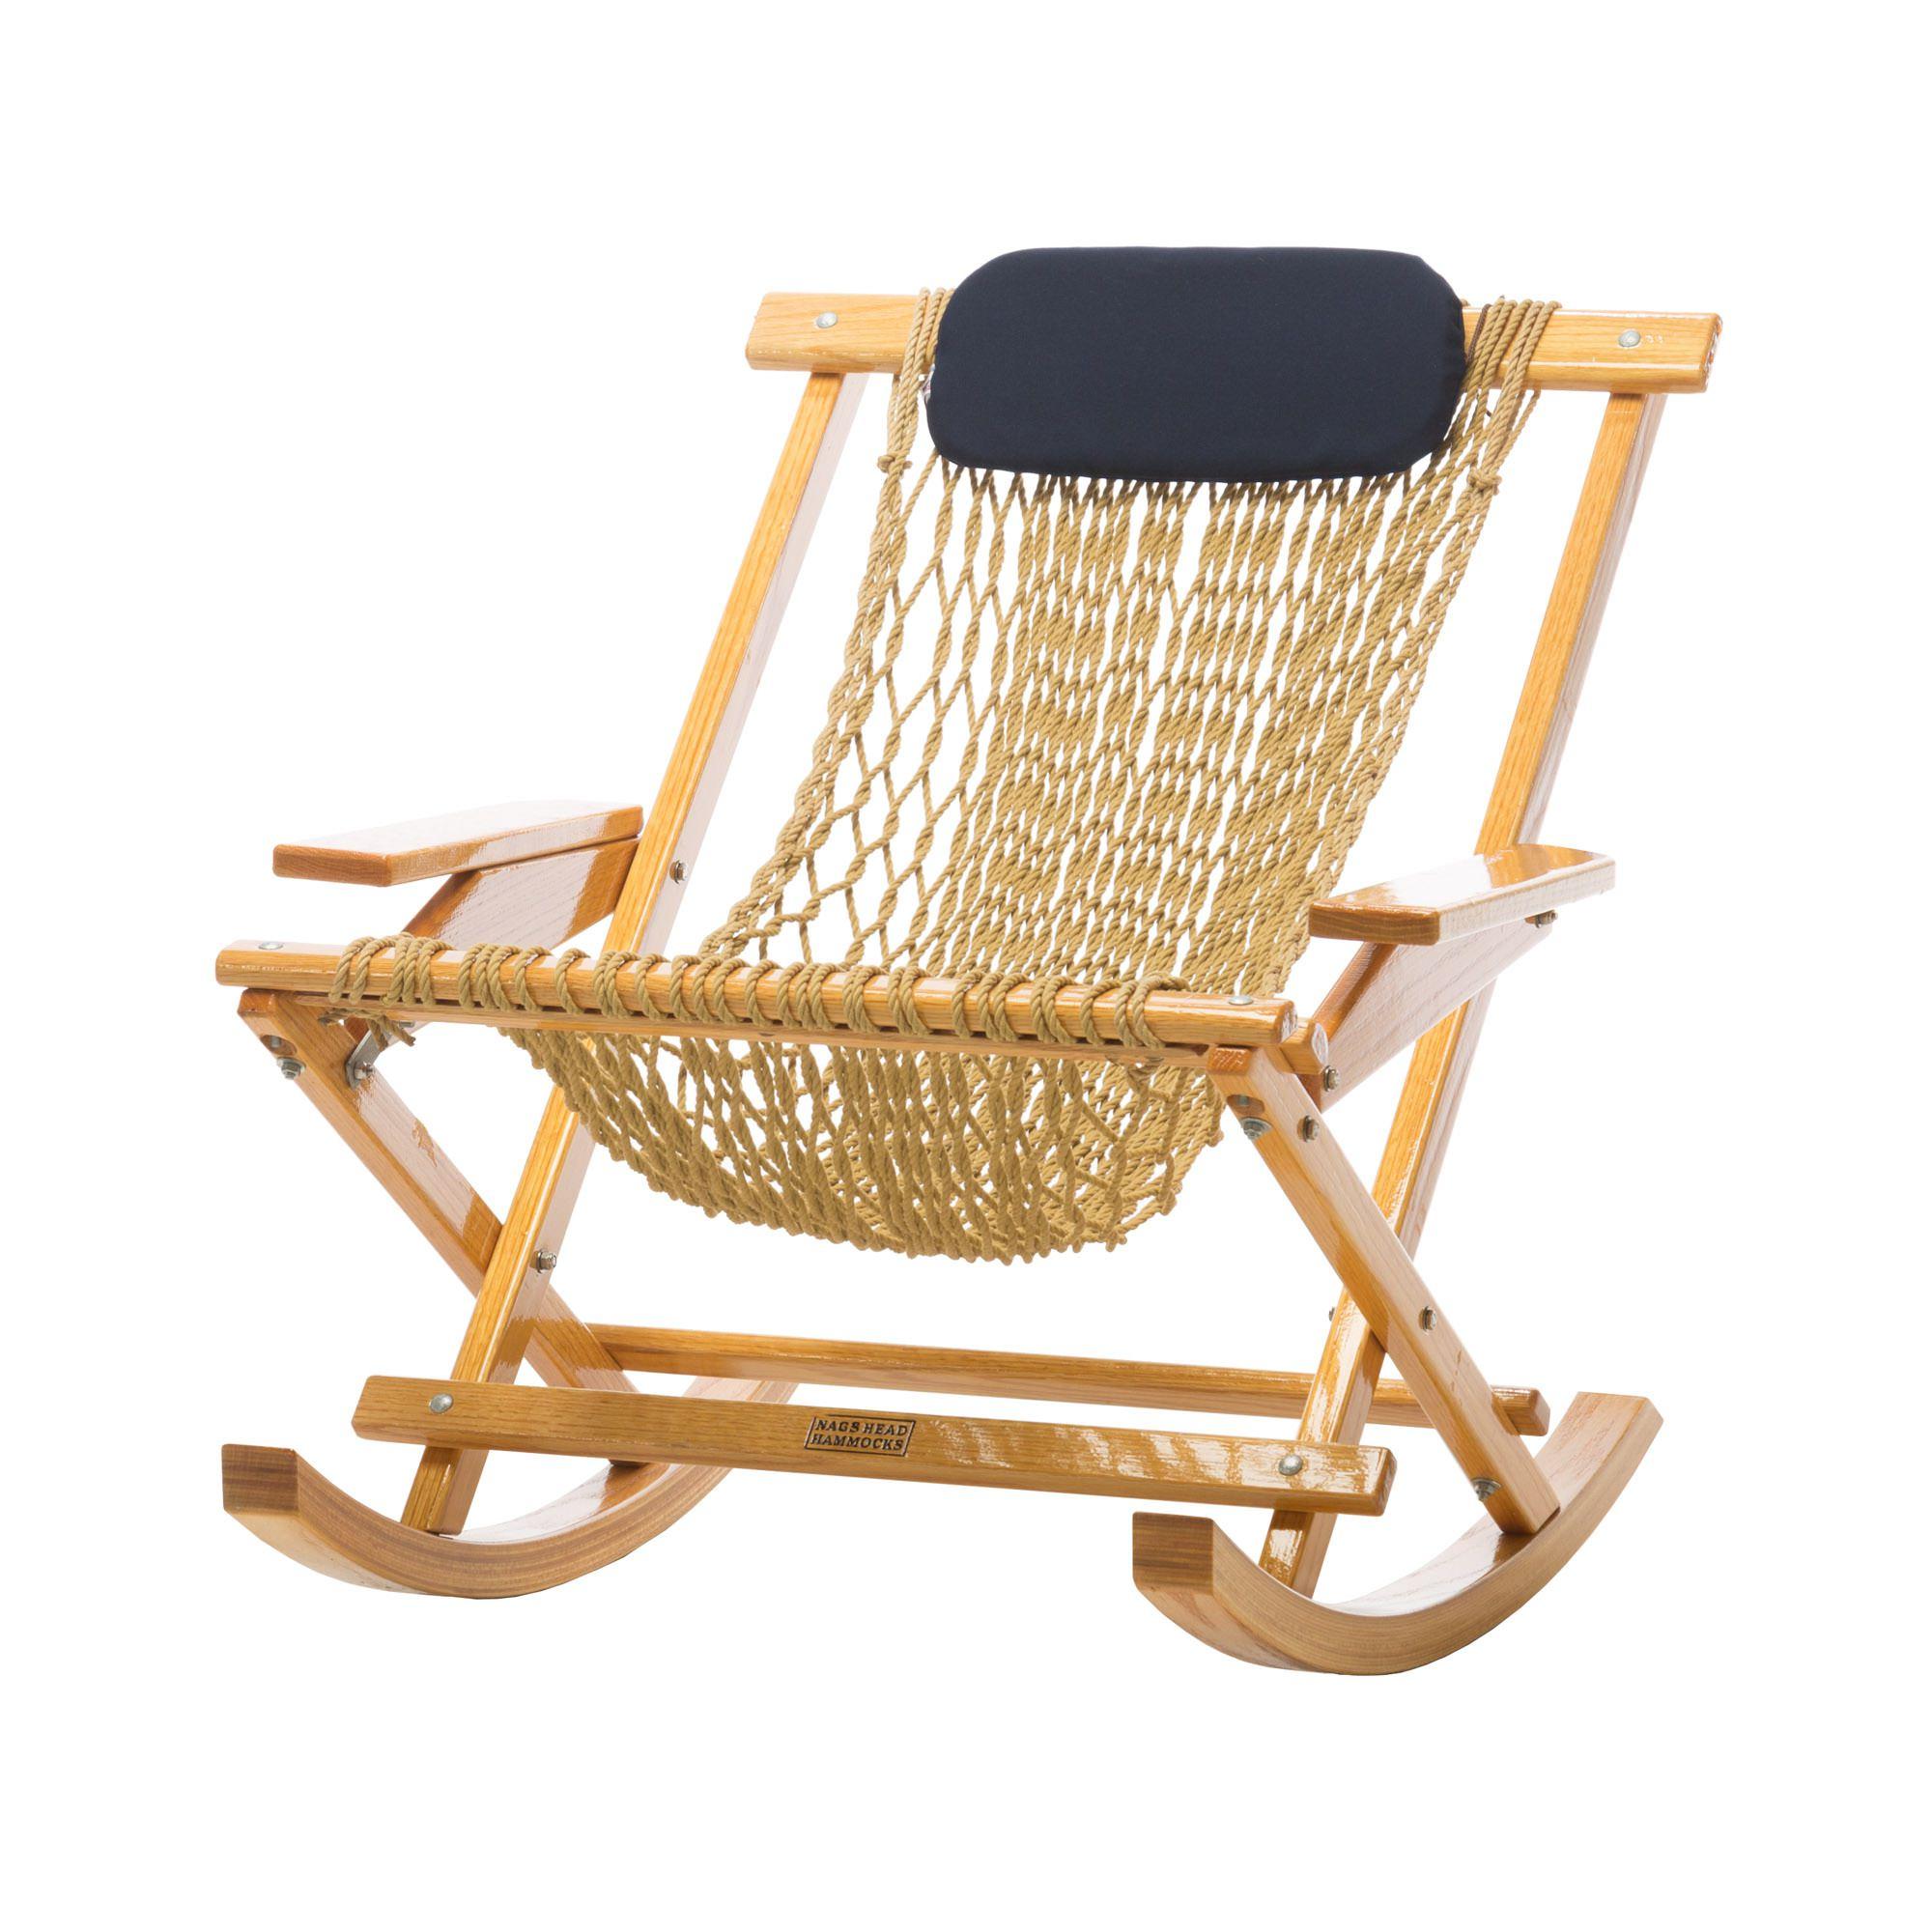 Chair Rocker Replacement Hardware